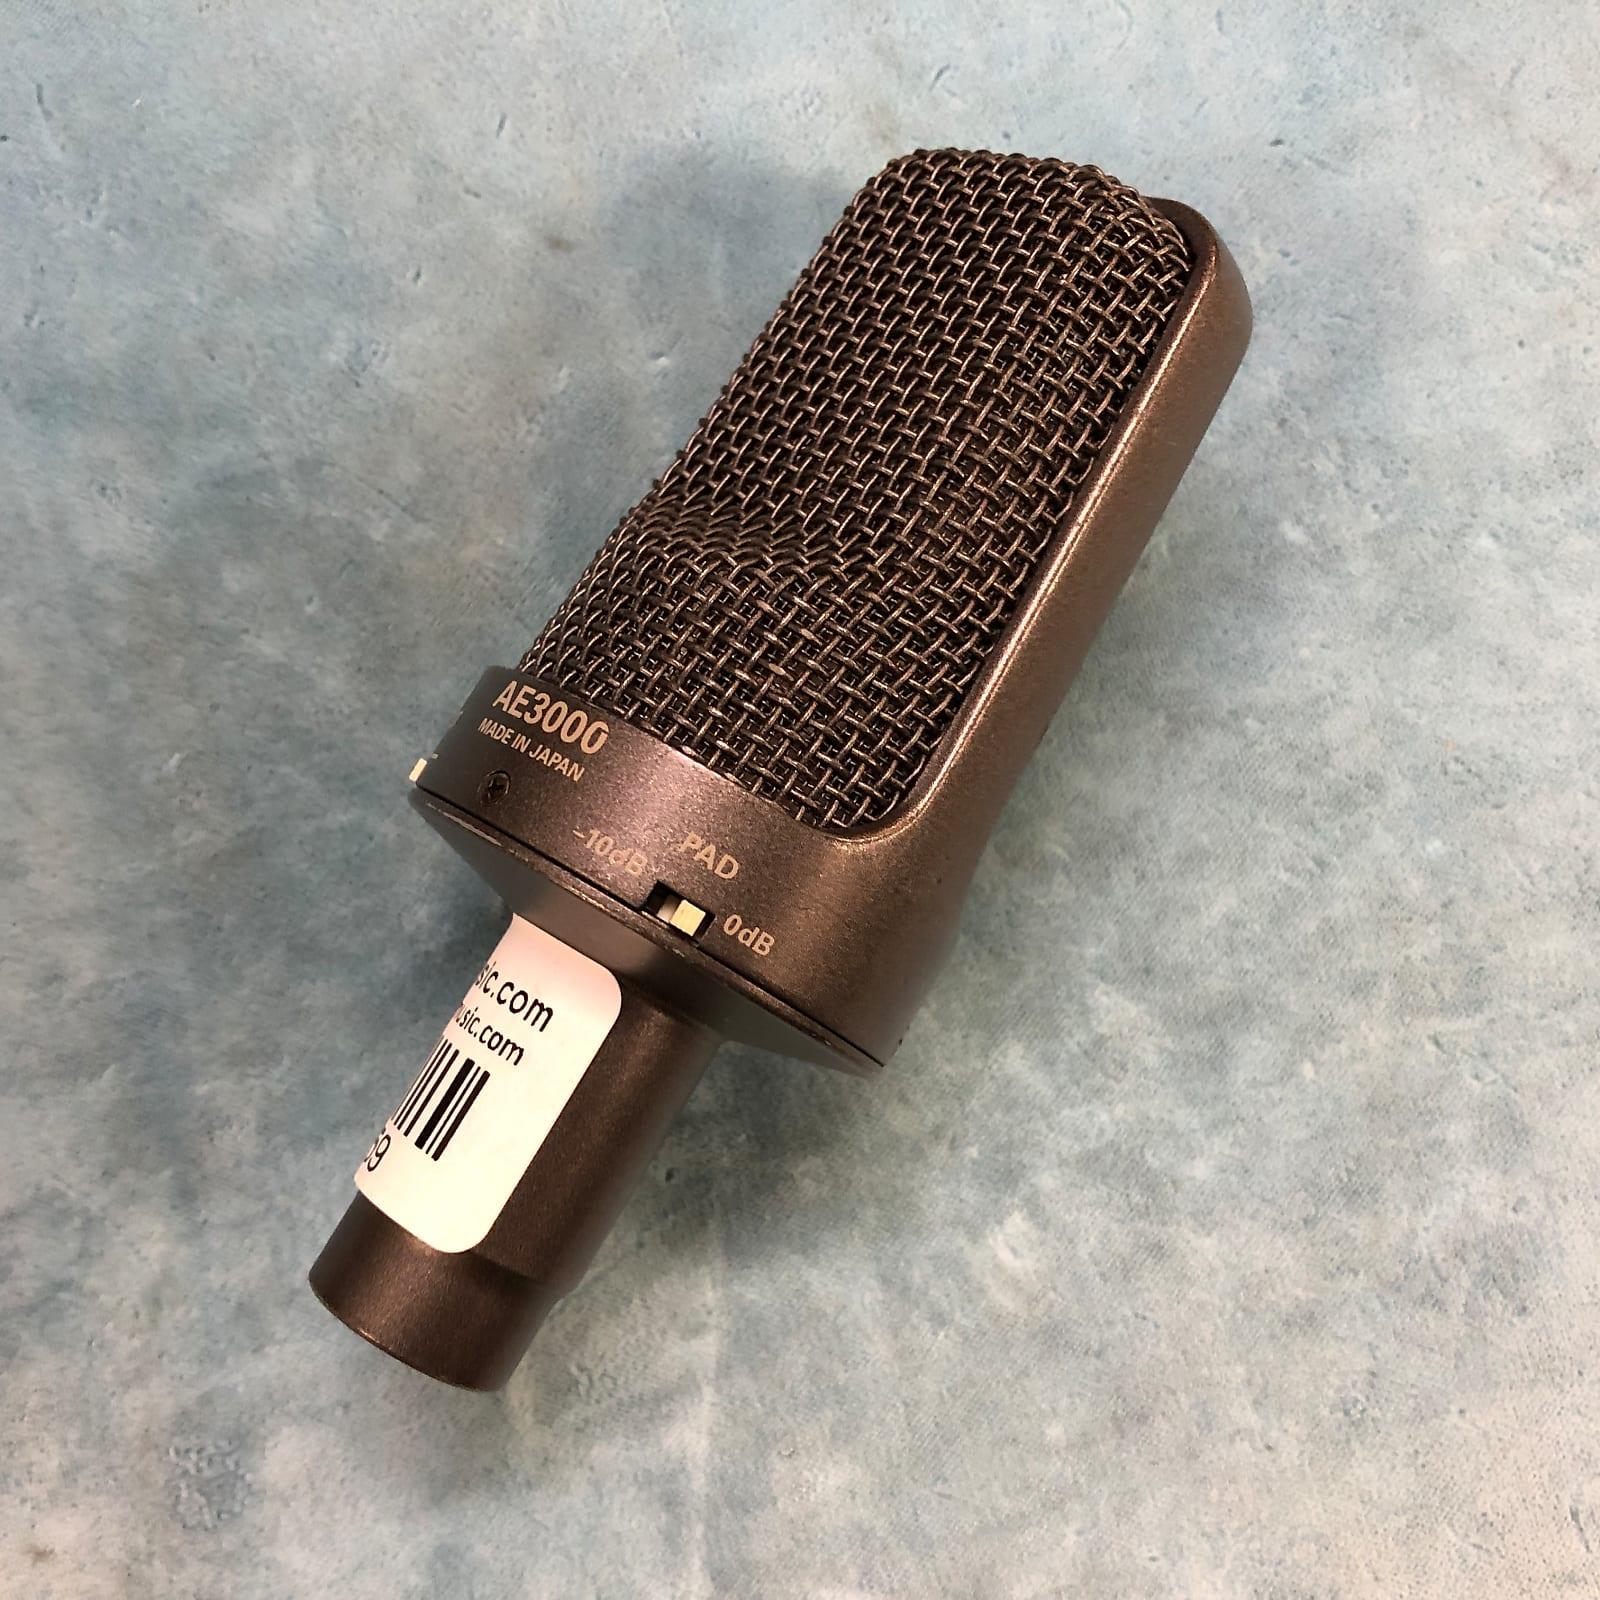 Audio-Technica AE3000 Large-Diaphragm Condenser Microphone w/ Clip